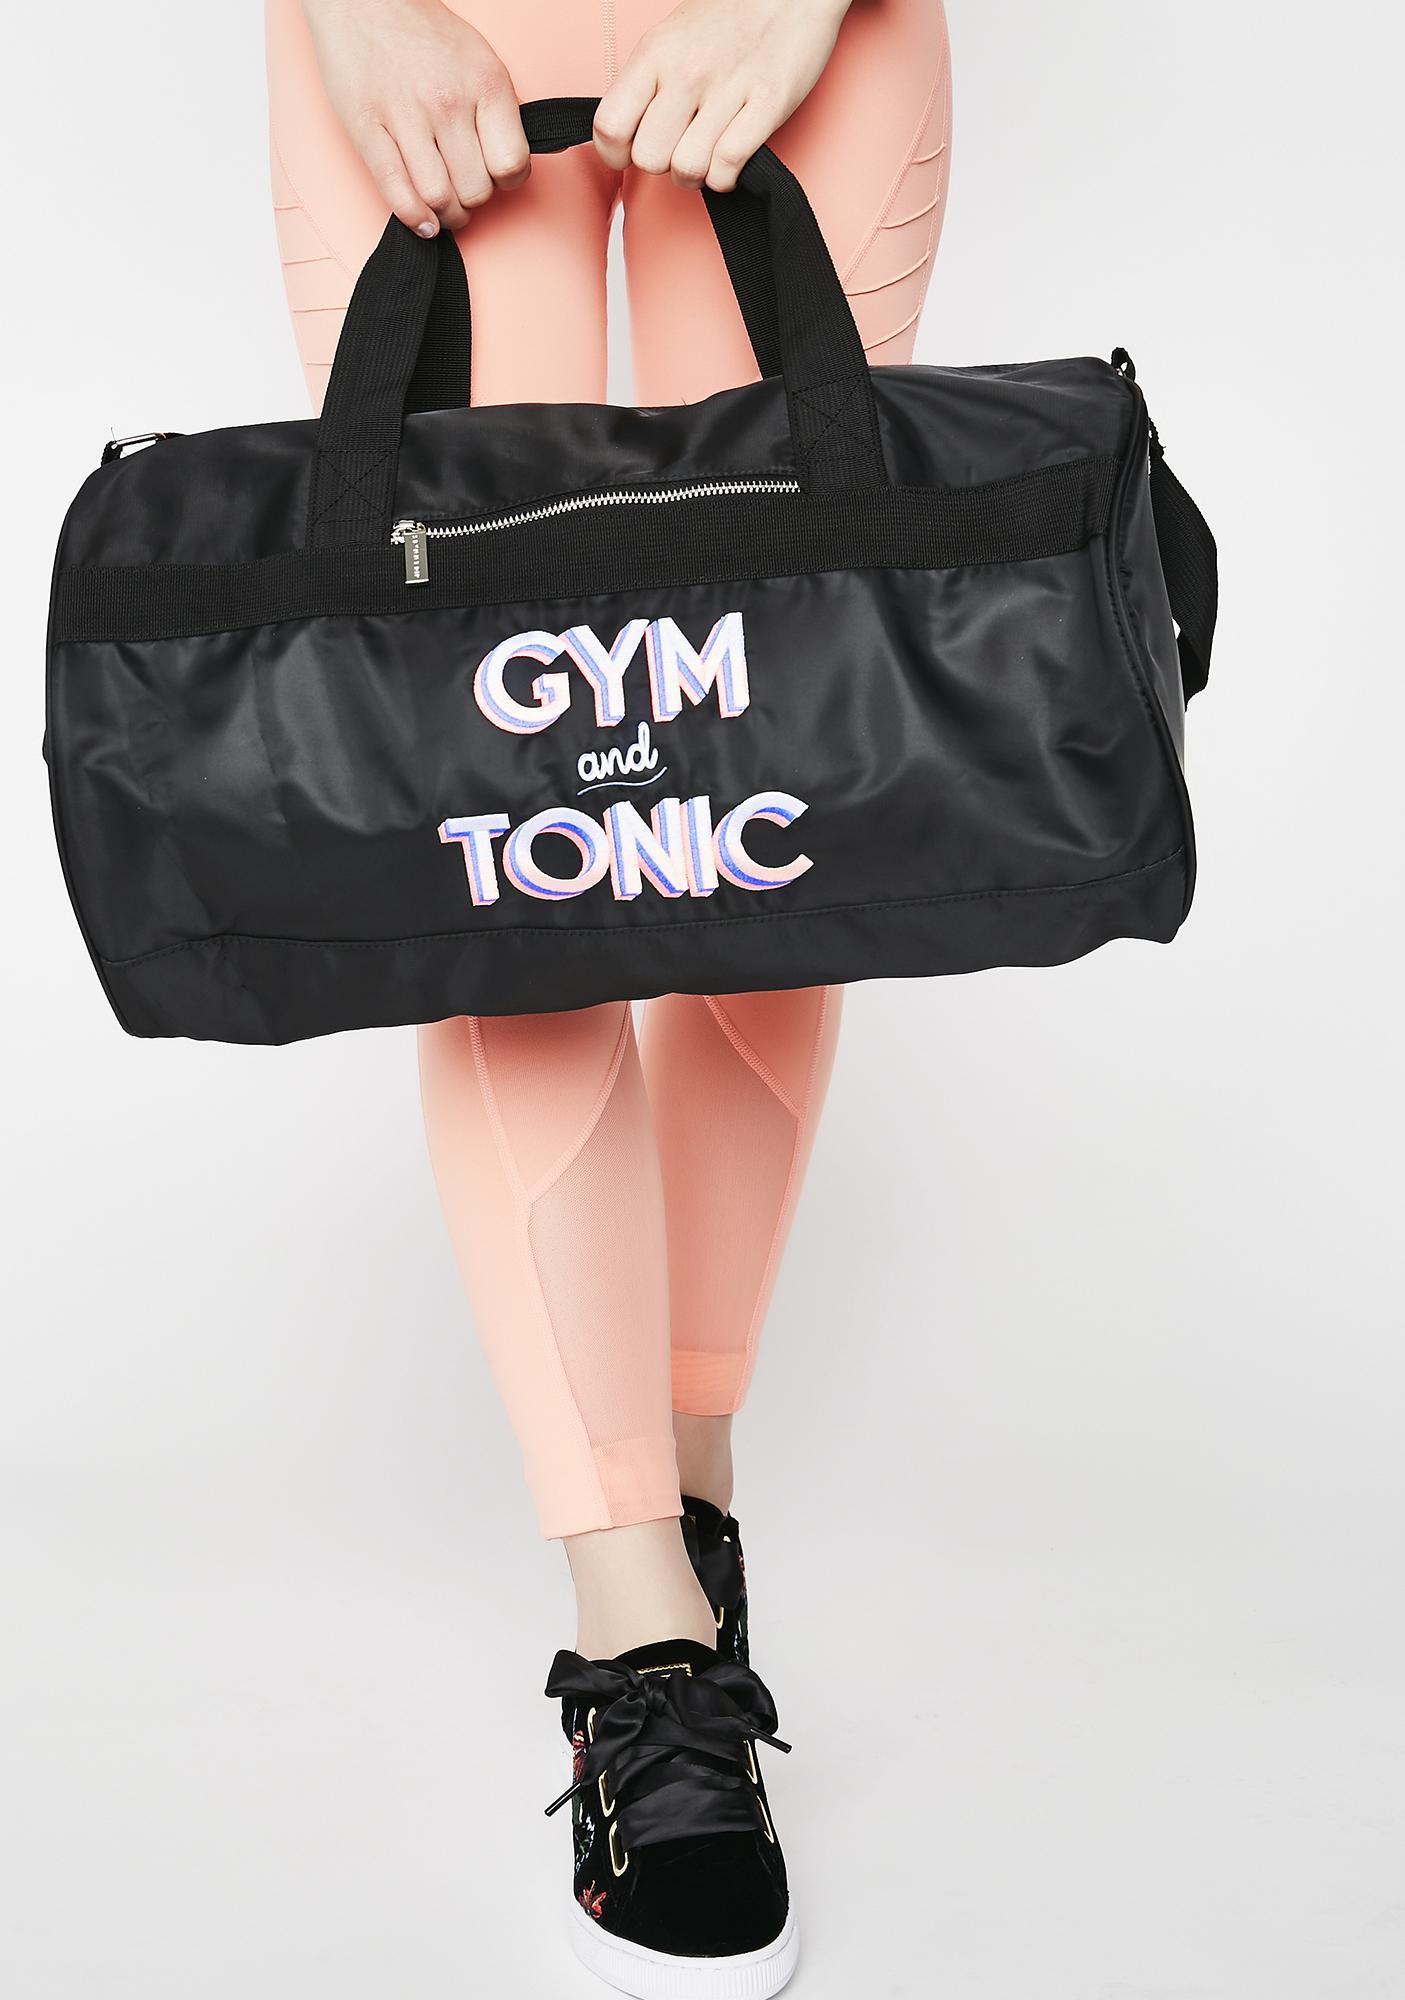 Skinnydip Gym & Tonic Gym Bag